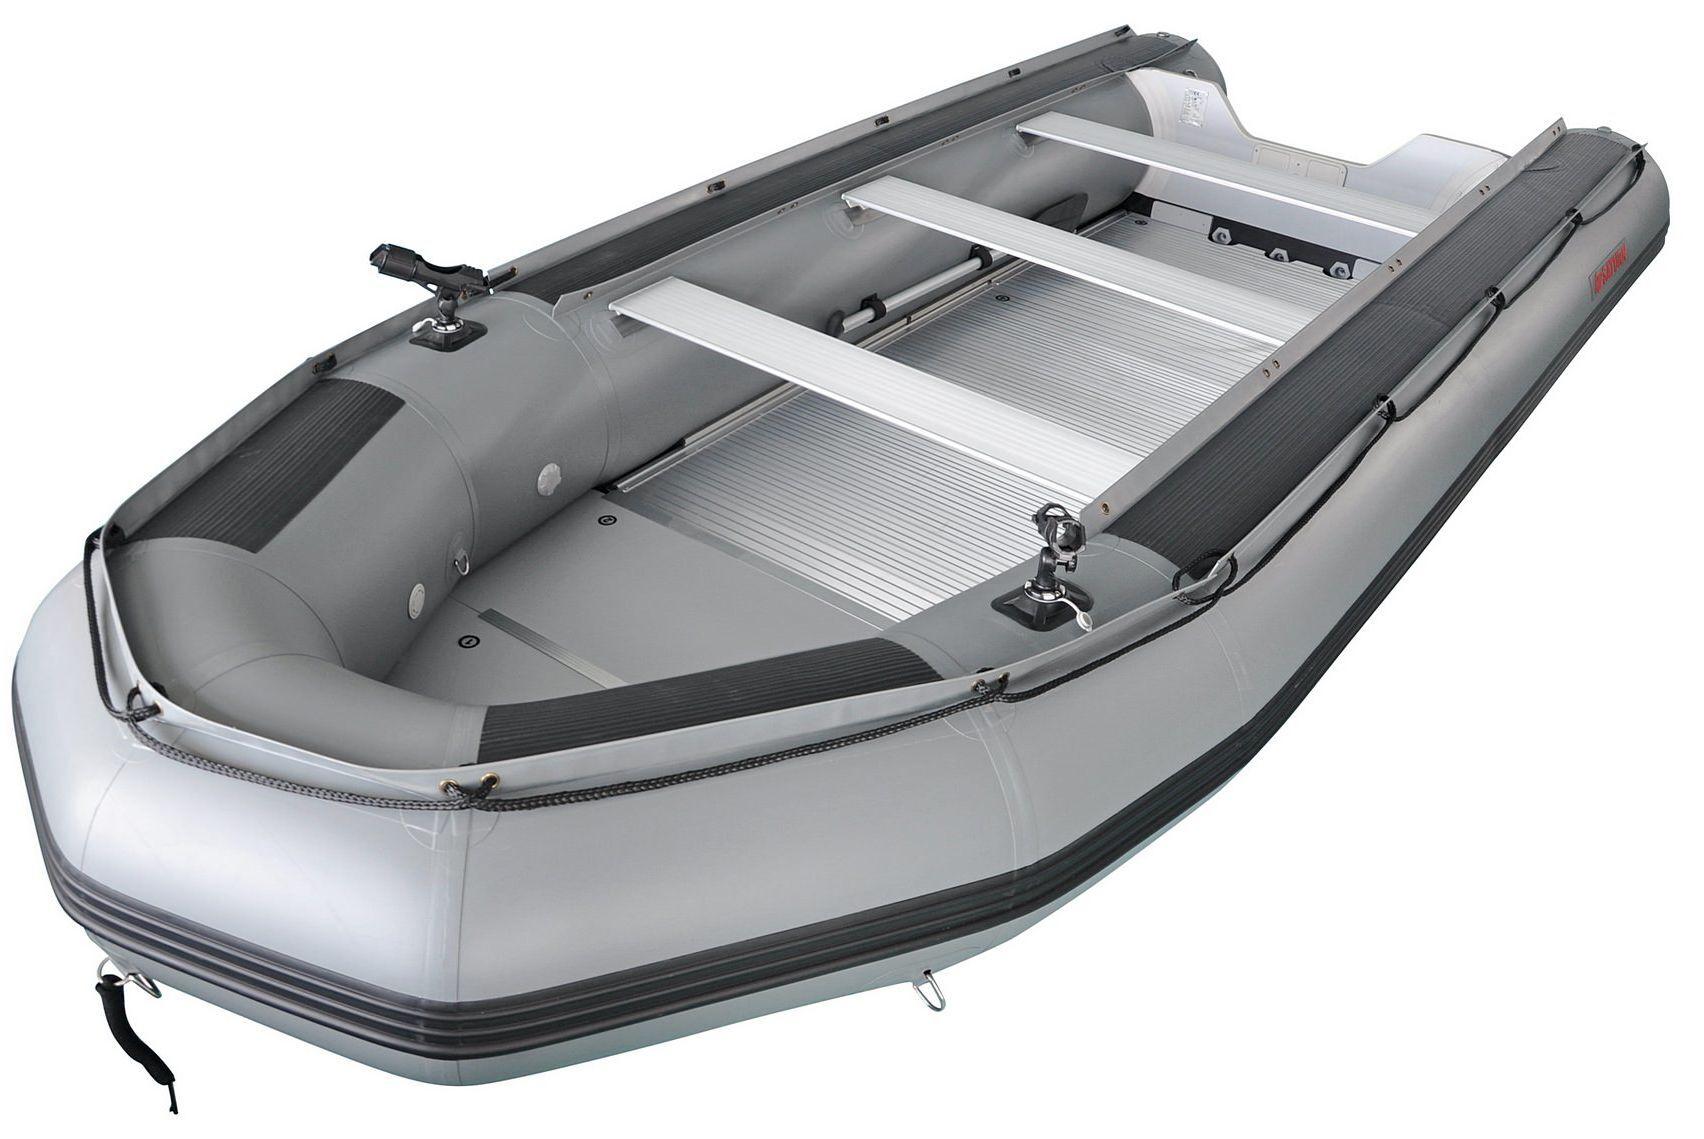 All New 15' Saturn Heavy-Duty Fishing Boat HD470